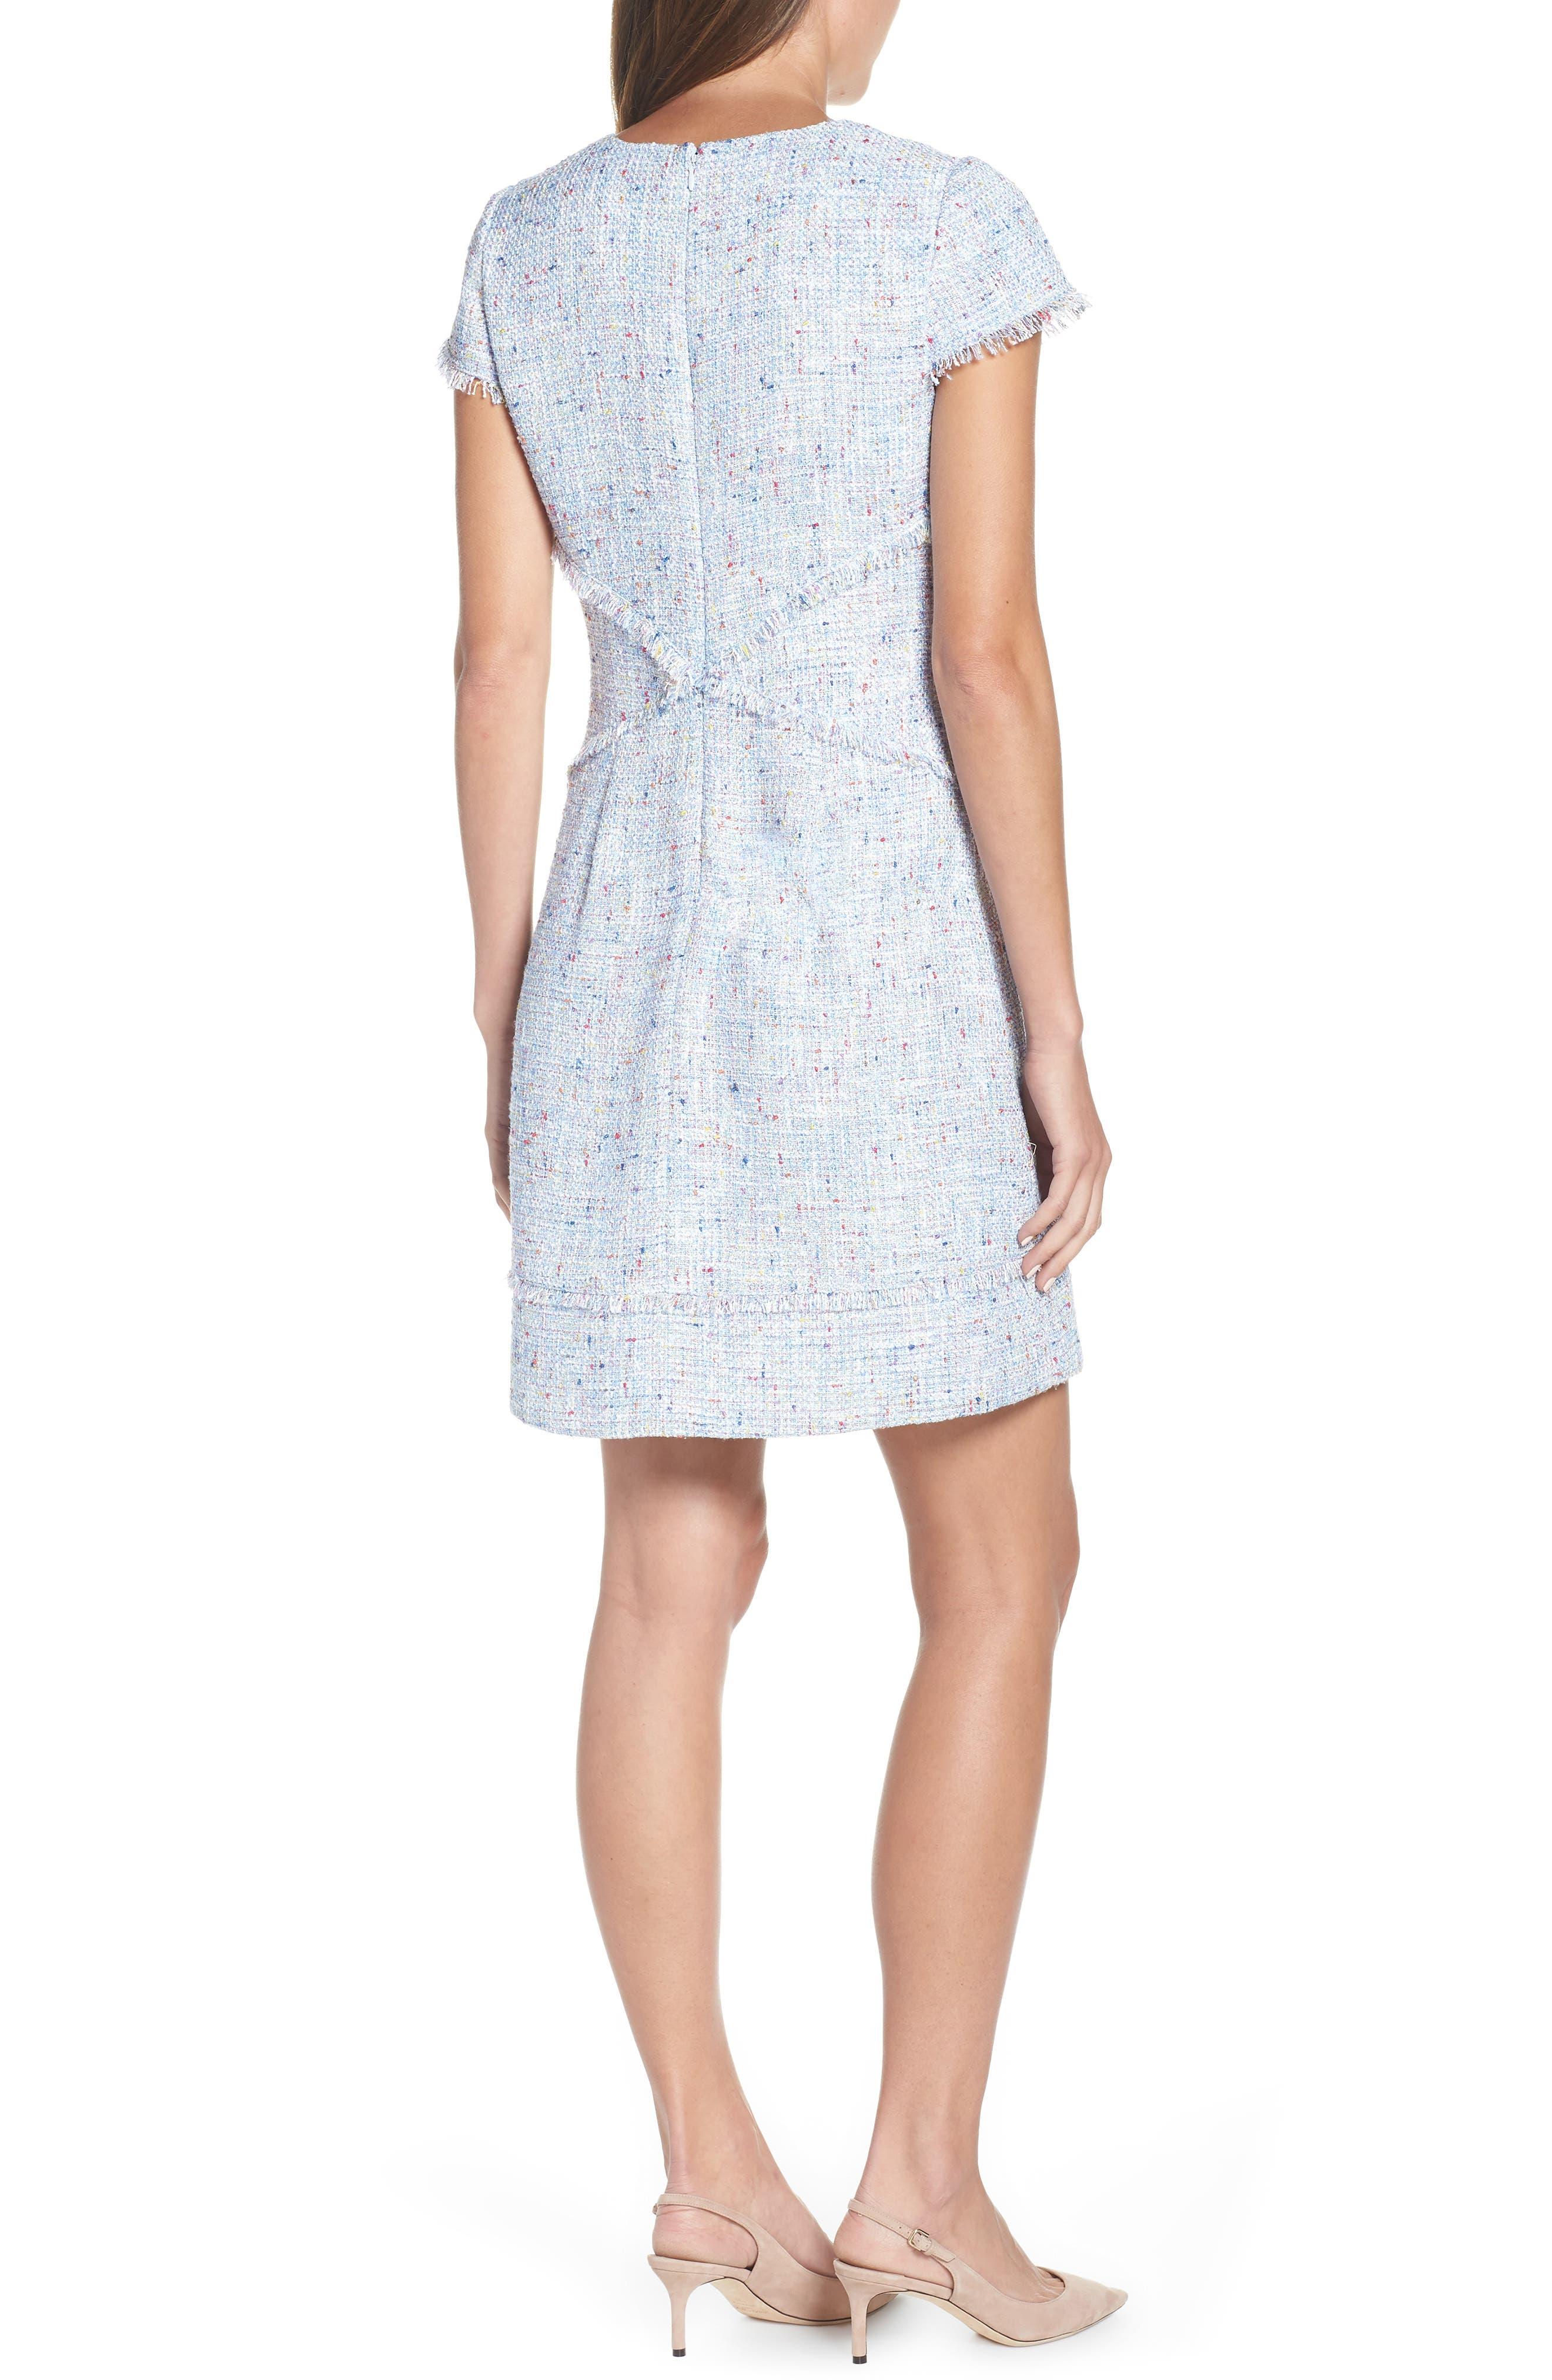 ELIZA J, Sheath Tweed Sheath Dress, Alternate thumbnail 2, color, BLUE